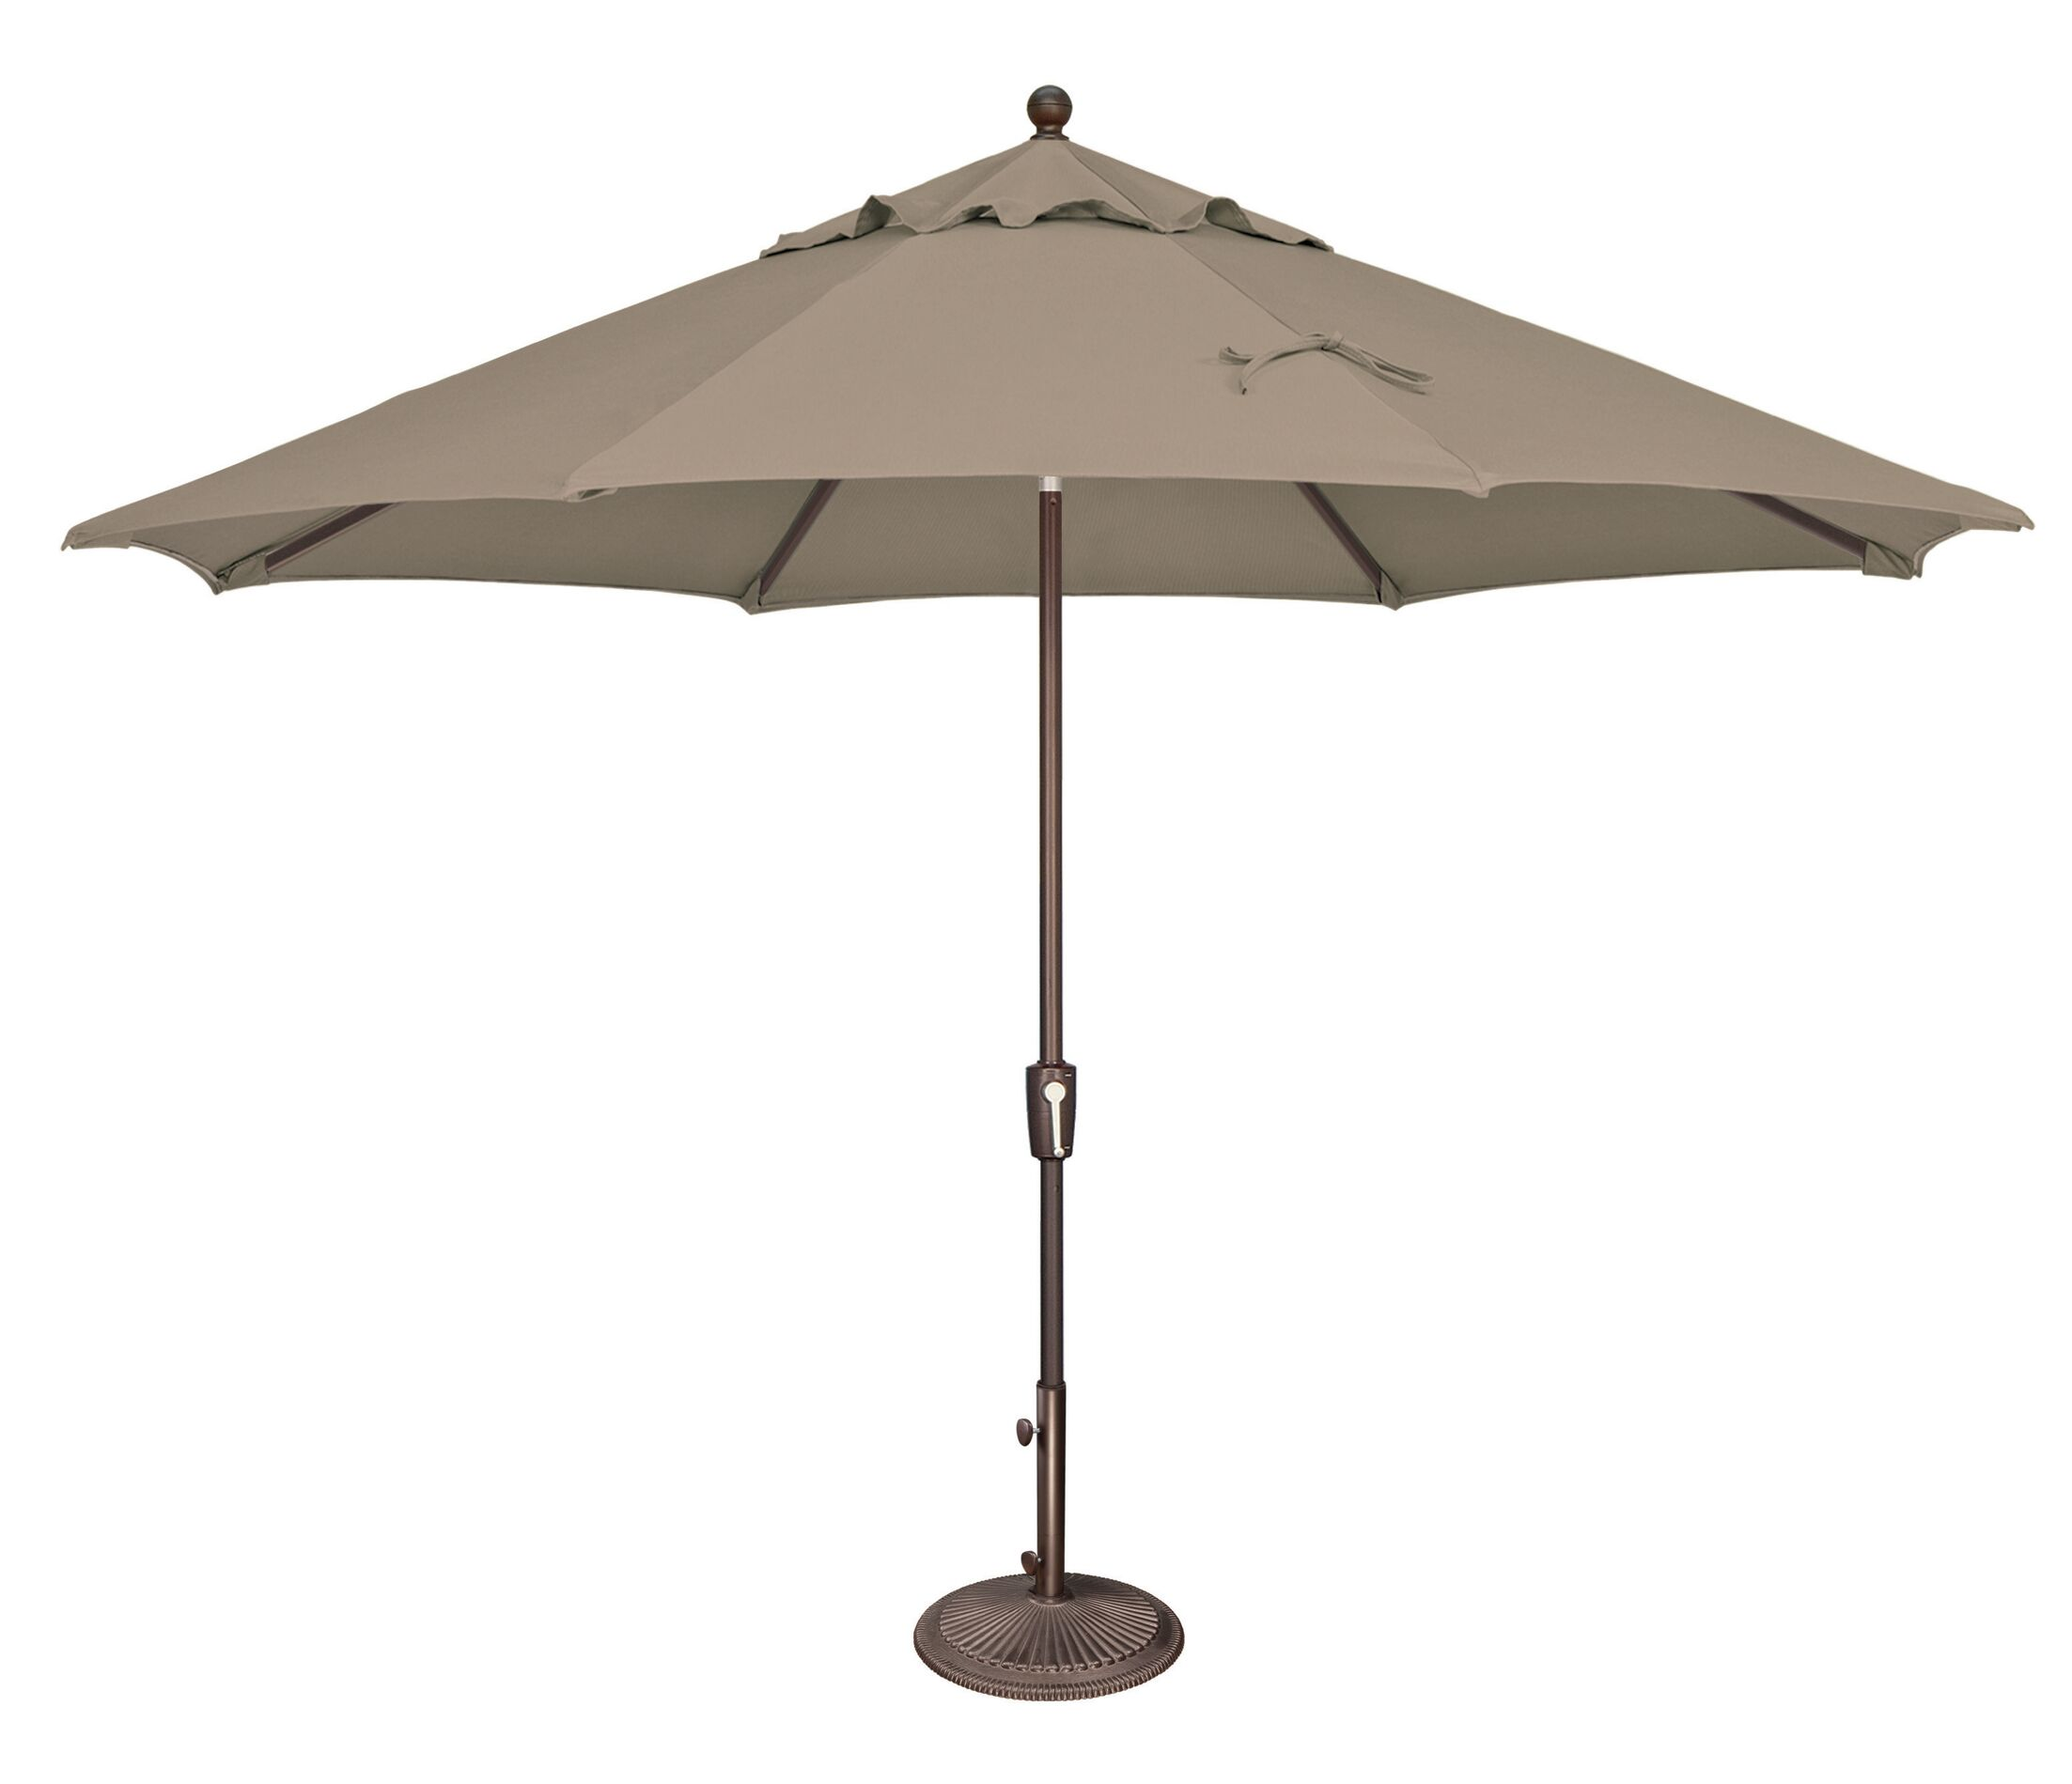 Catalina 11' Market Umbrella Fabric: Sunbrella / Cocoa